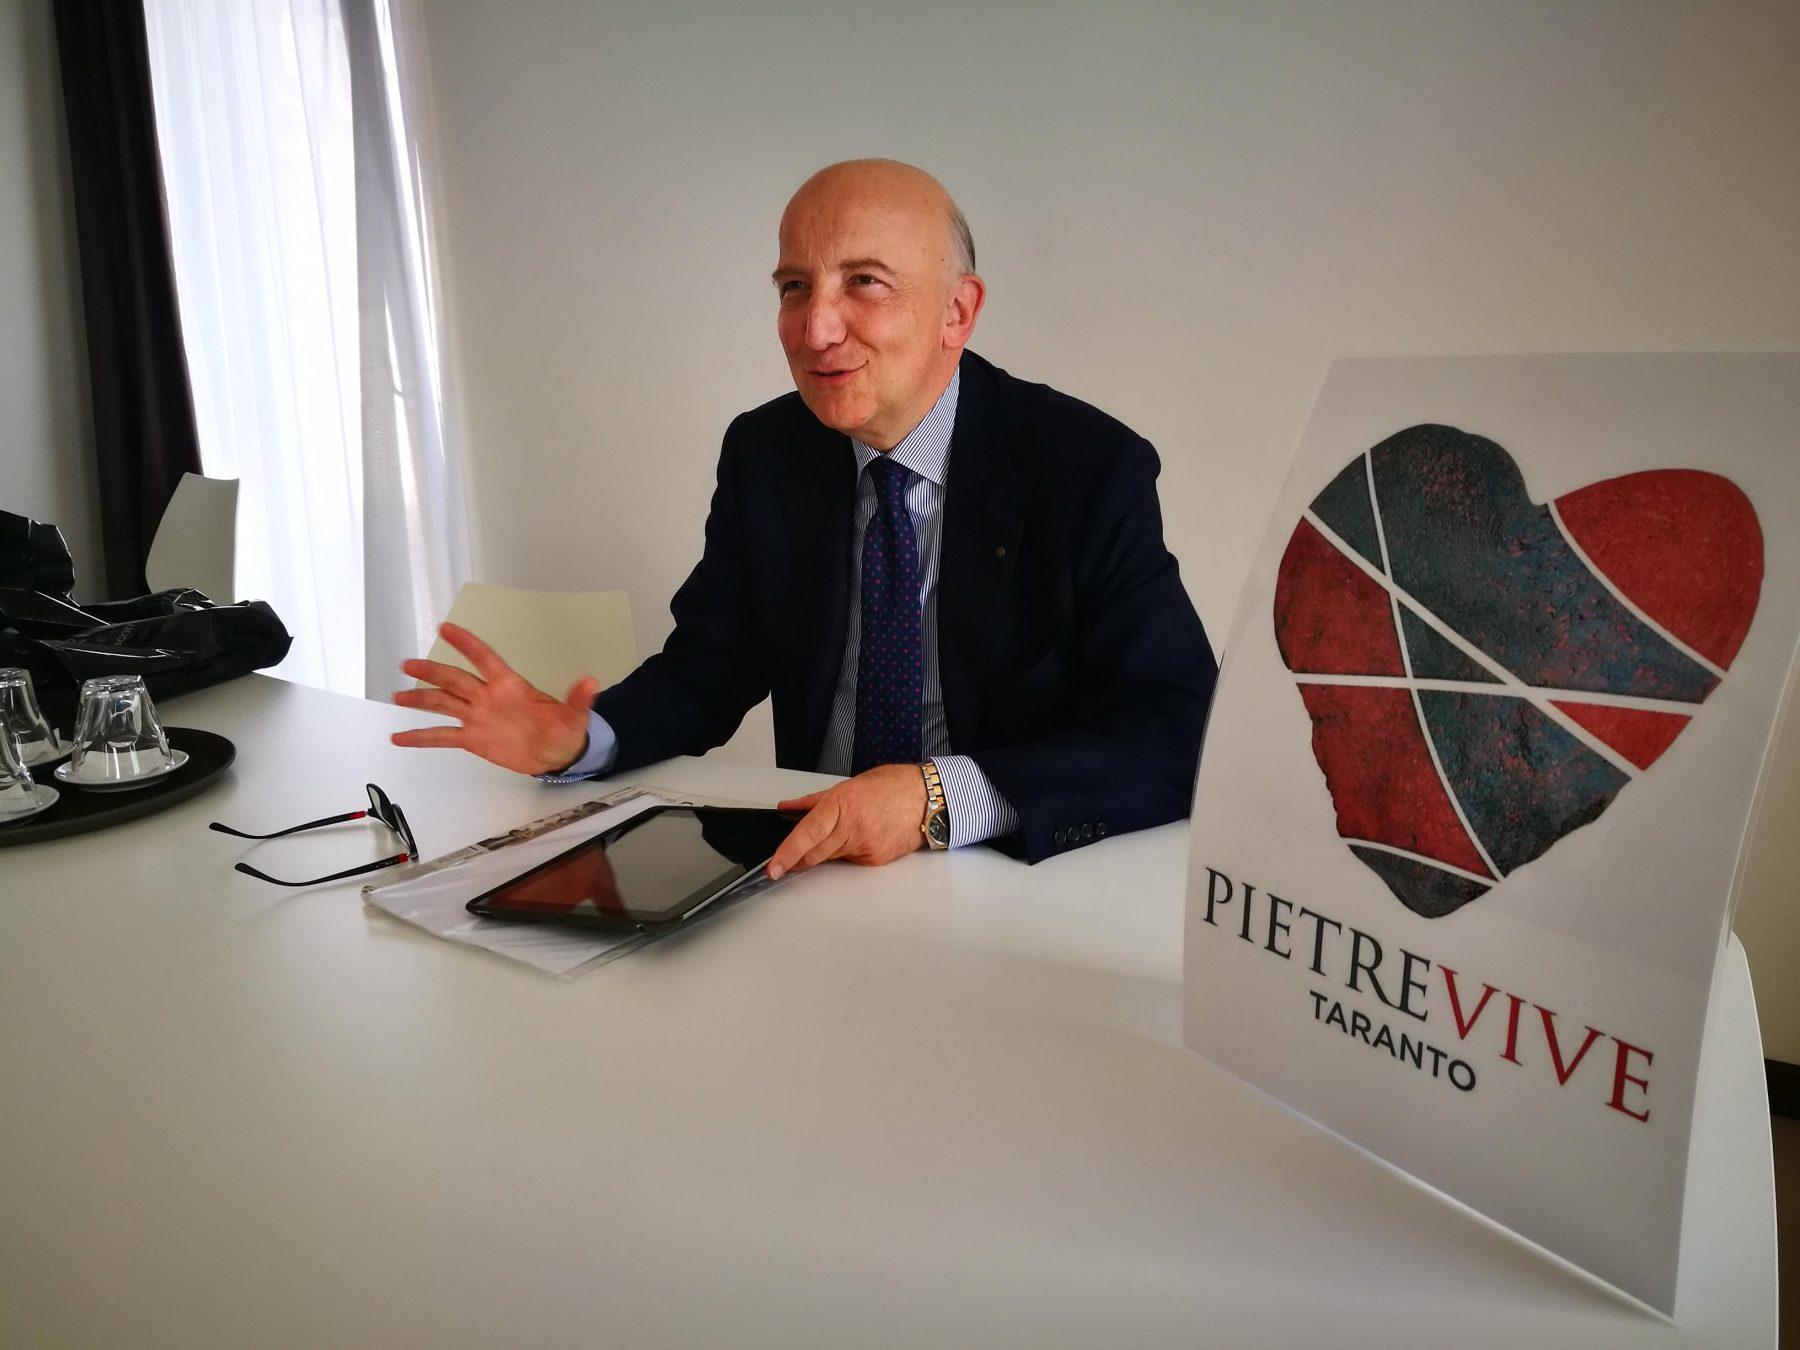 https://i2.wp.com/www.laringhiera.net/wp-content/uploads/2018/01/Luigi-Romandini-con-logo-Pietre-Vive-e1515230993991.jpg